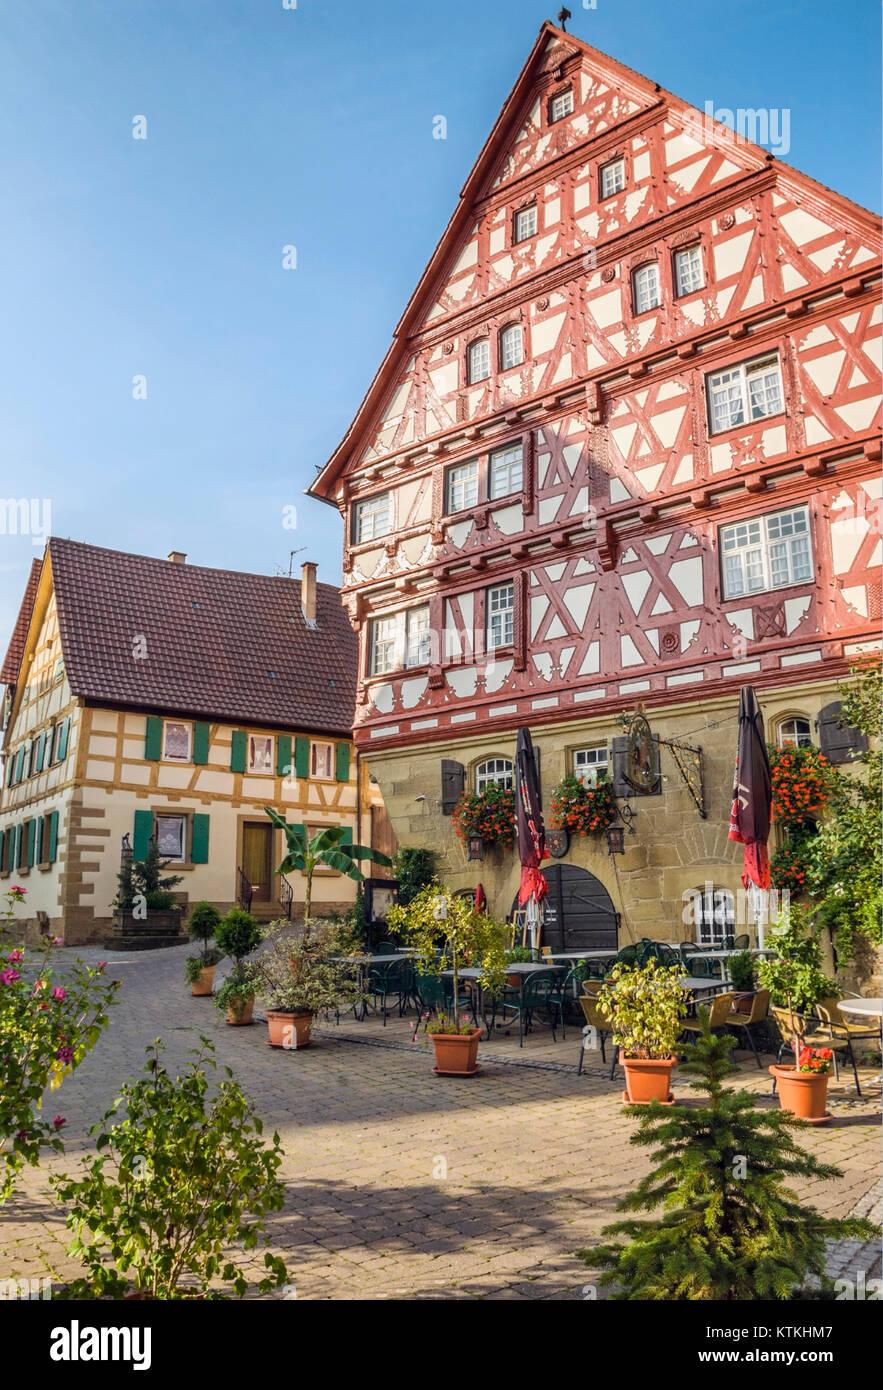 Baumansche House, una histórica casa de marcos de madera en el ...